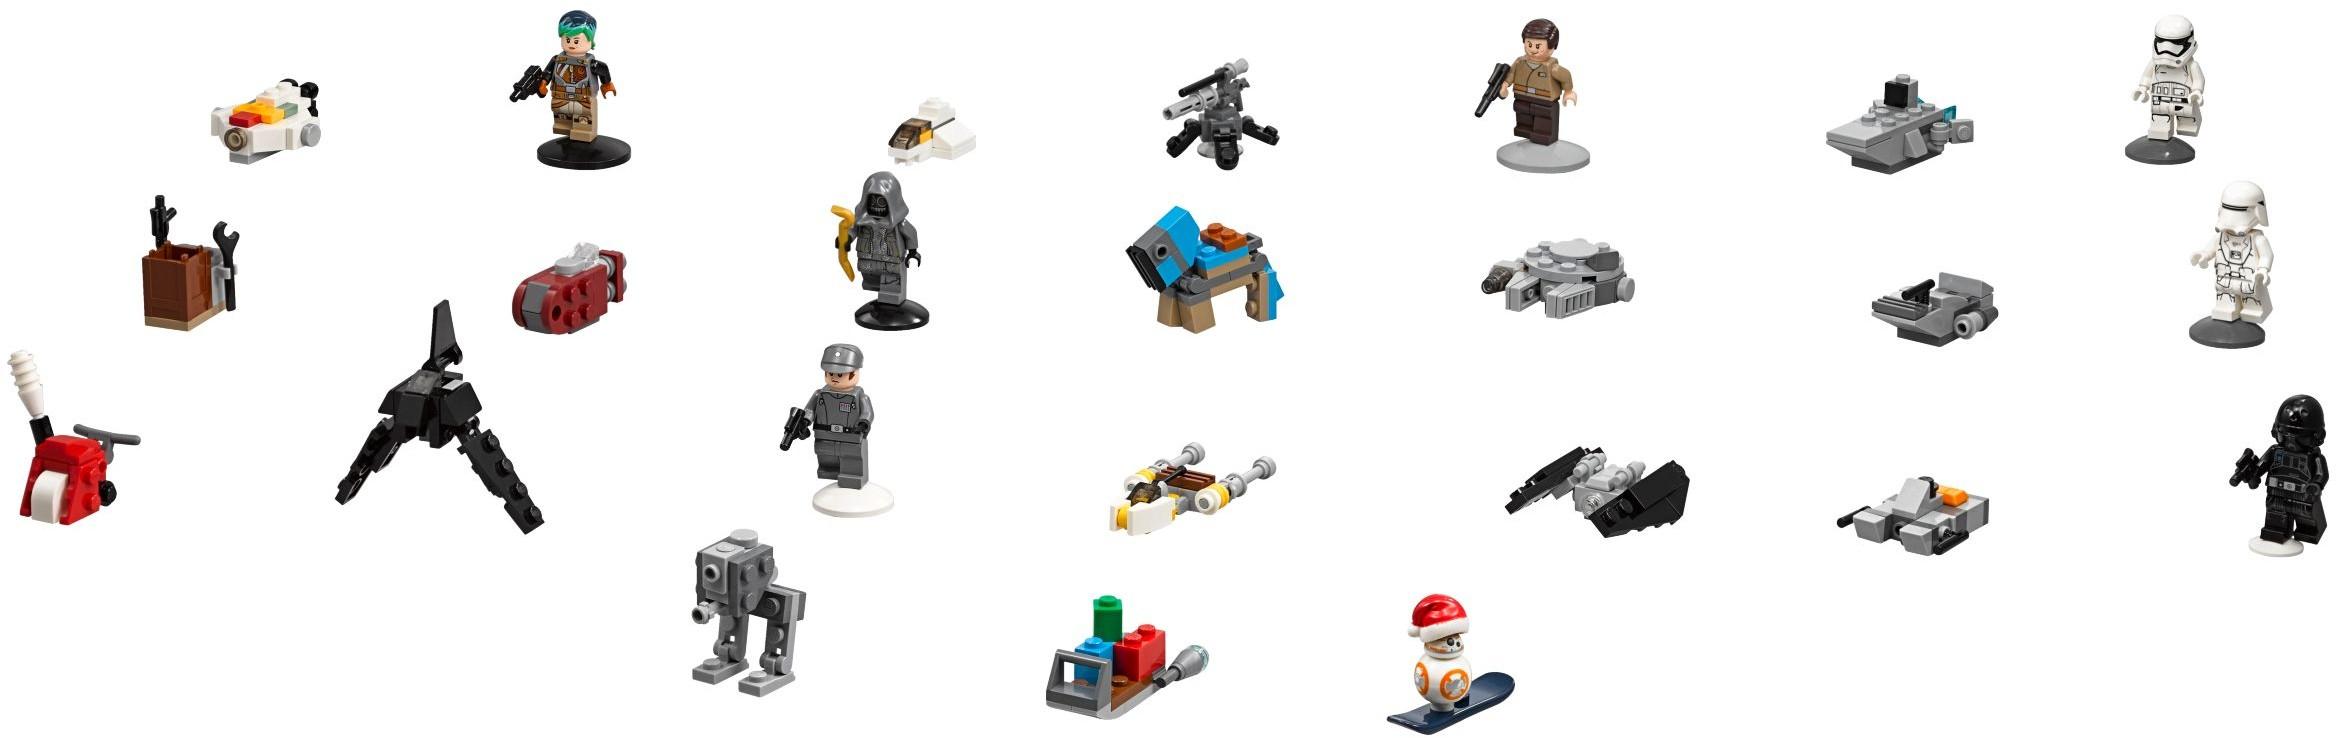 Lego 75184 Star Wars Advent Calendar Instructions, Star Wars with Lego Star Wars Advent Calendar 2011 Instructions